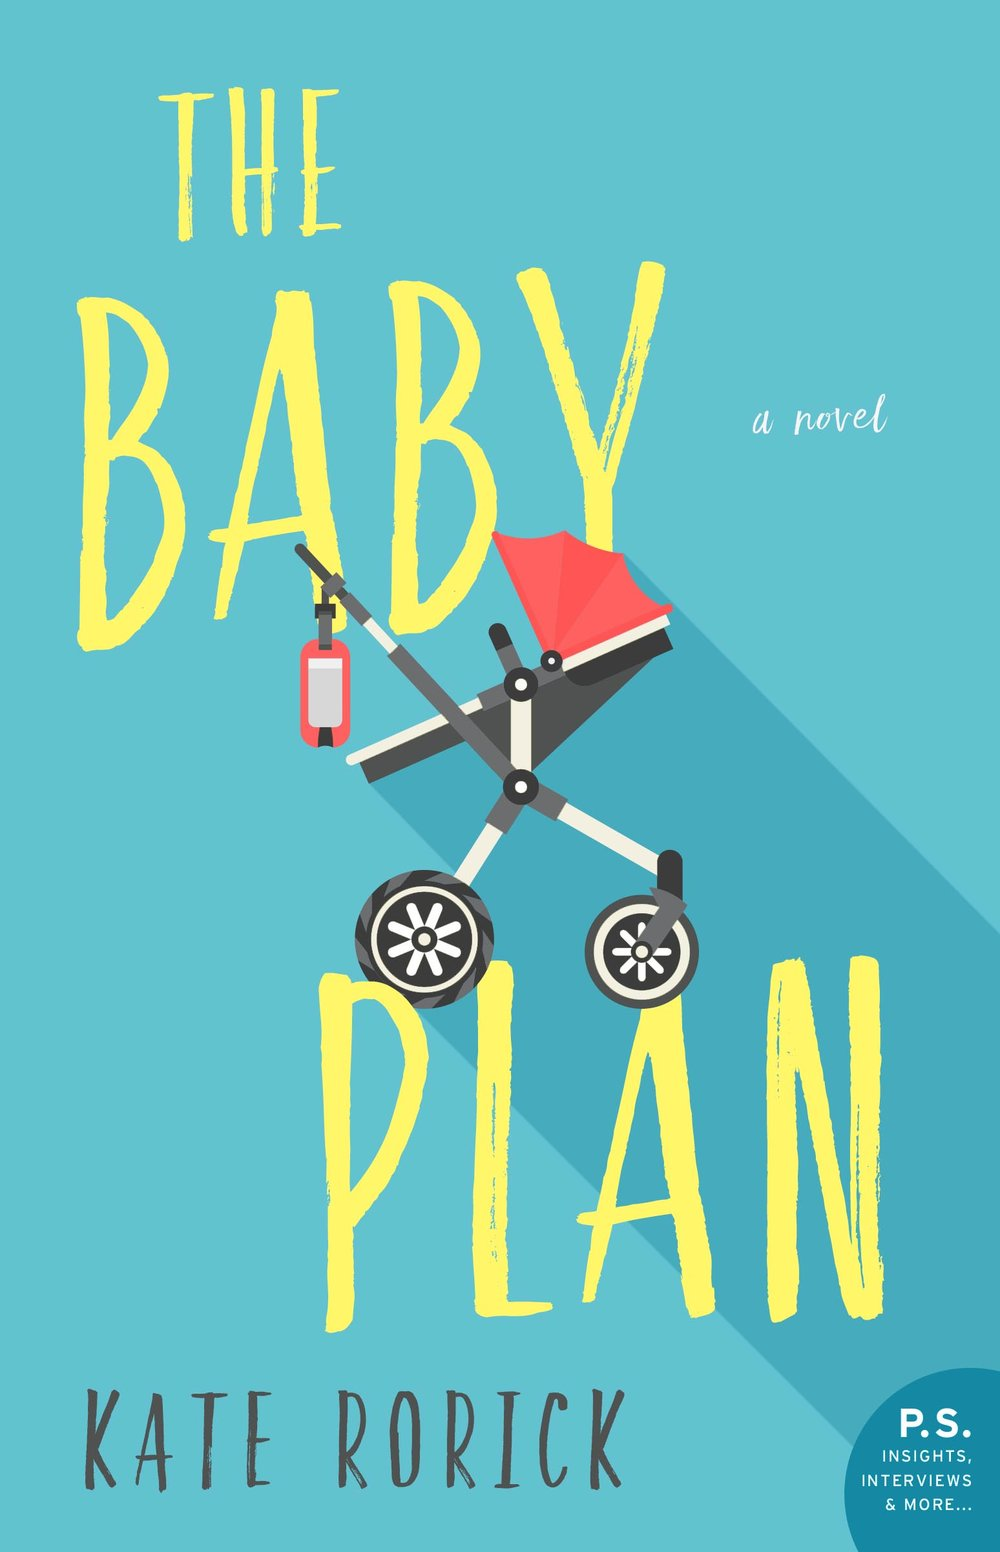 BabyPlan_3A.jpg